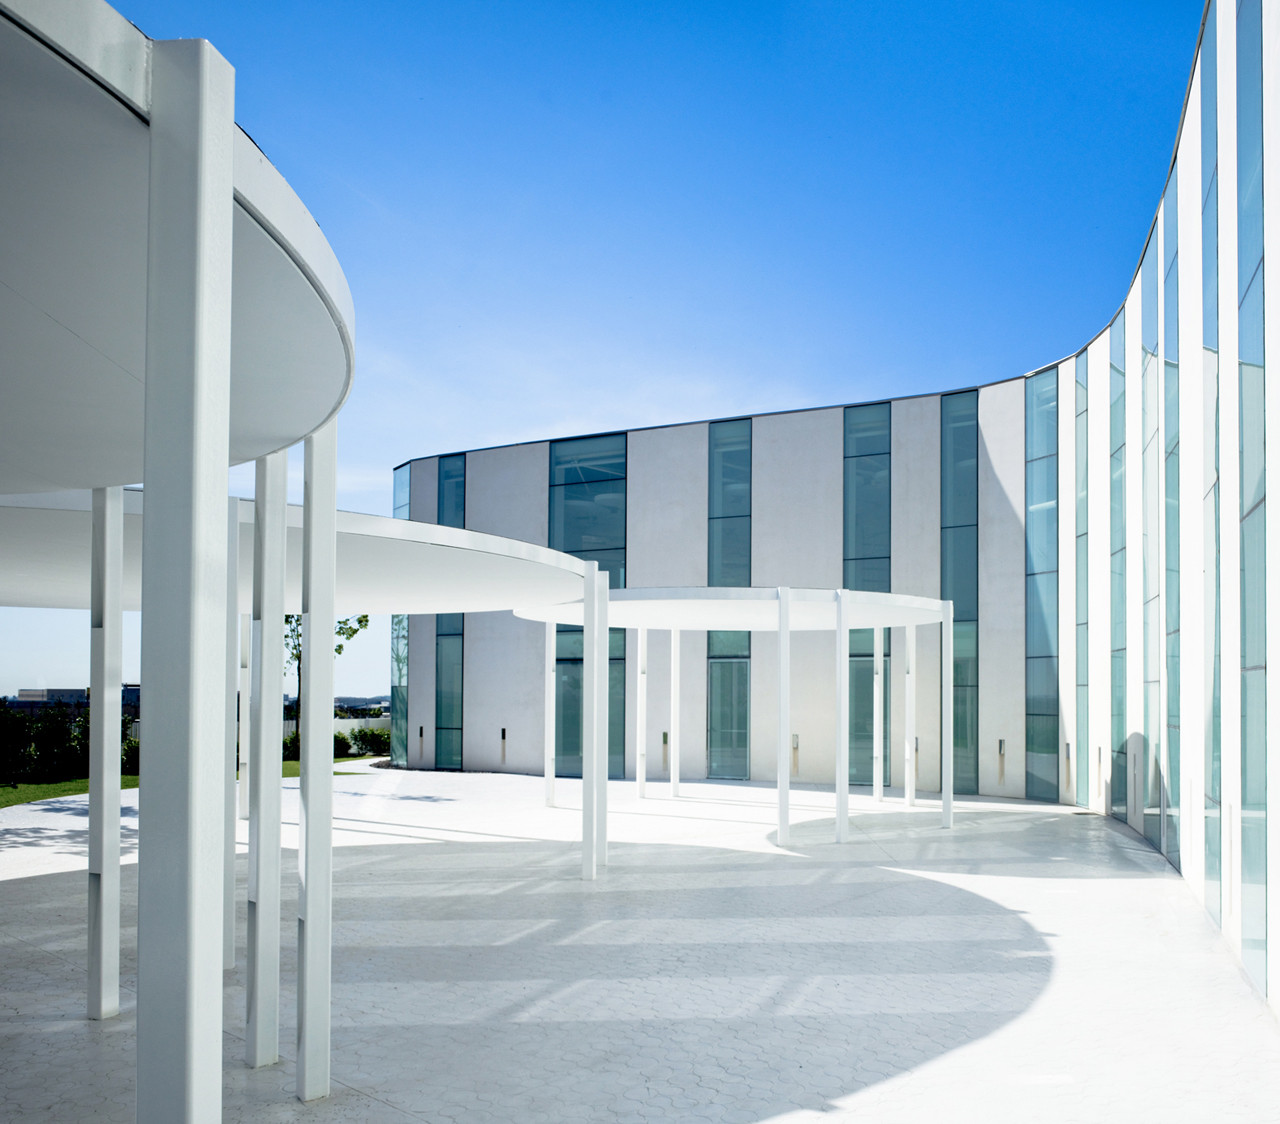 Myrtus Convention Center / Ramon Esteve, Courtesy of Ramon Esteve